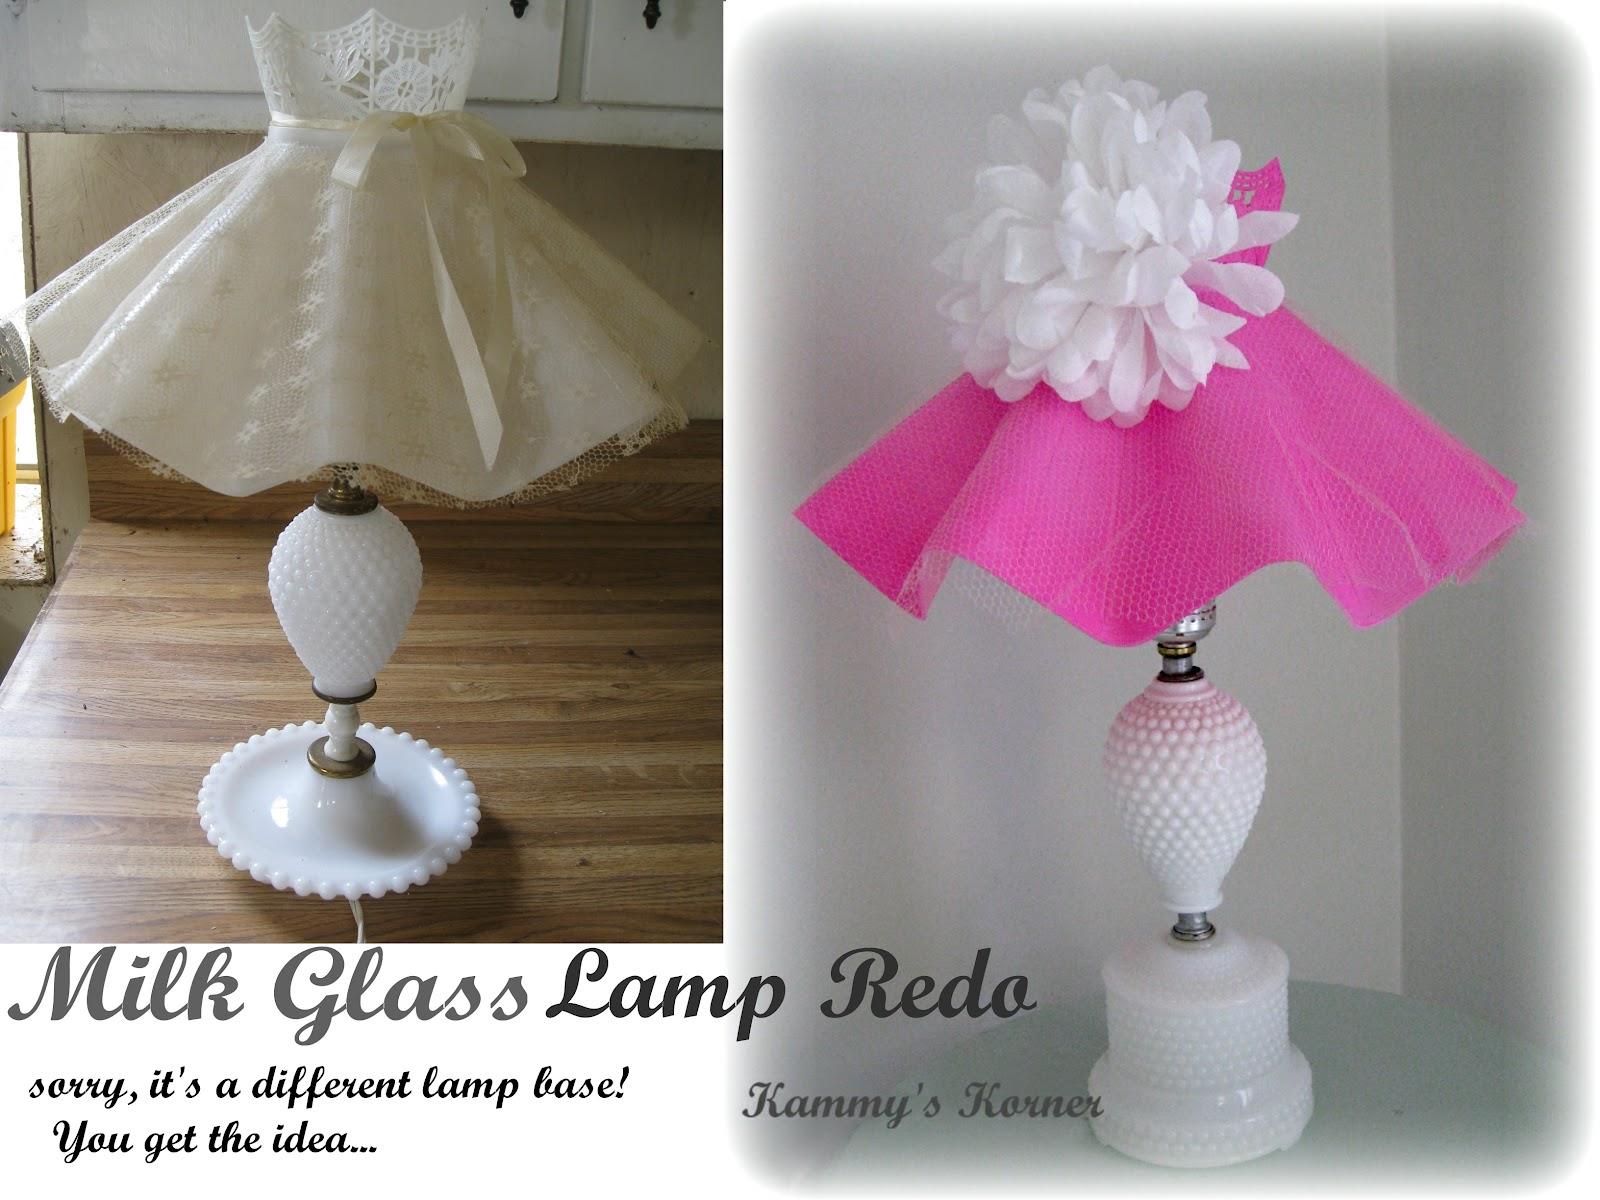 Kammys korner darling n girly milk glass lamp aloadofball Gallery